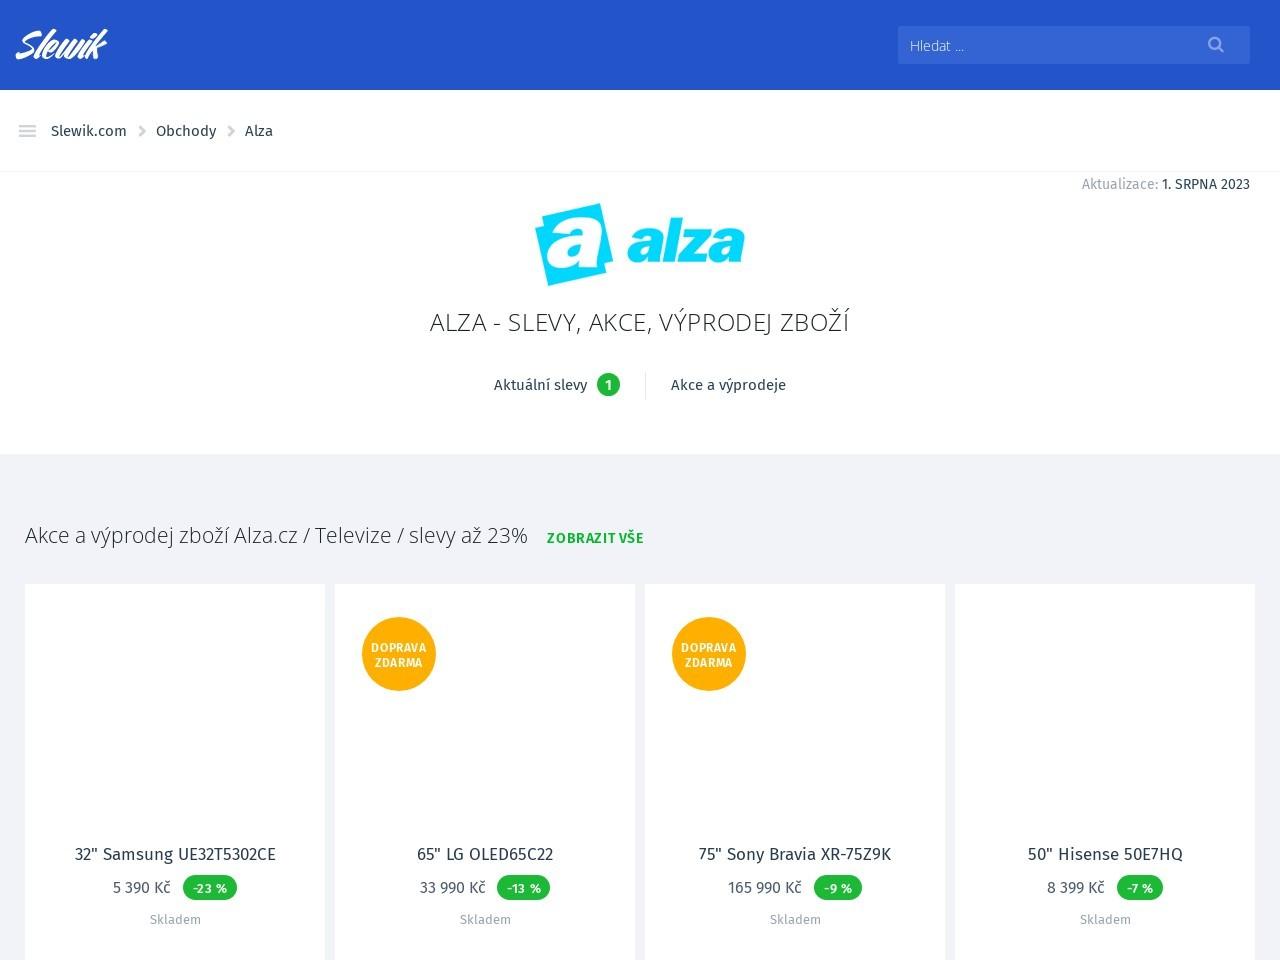 Alza (Zdroj: Wordpress.com)